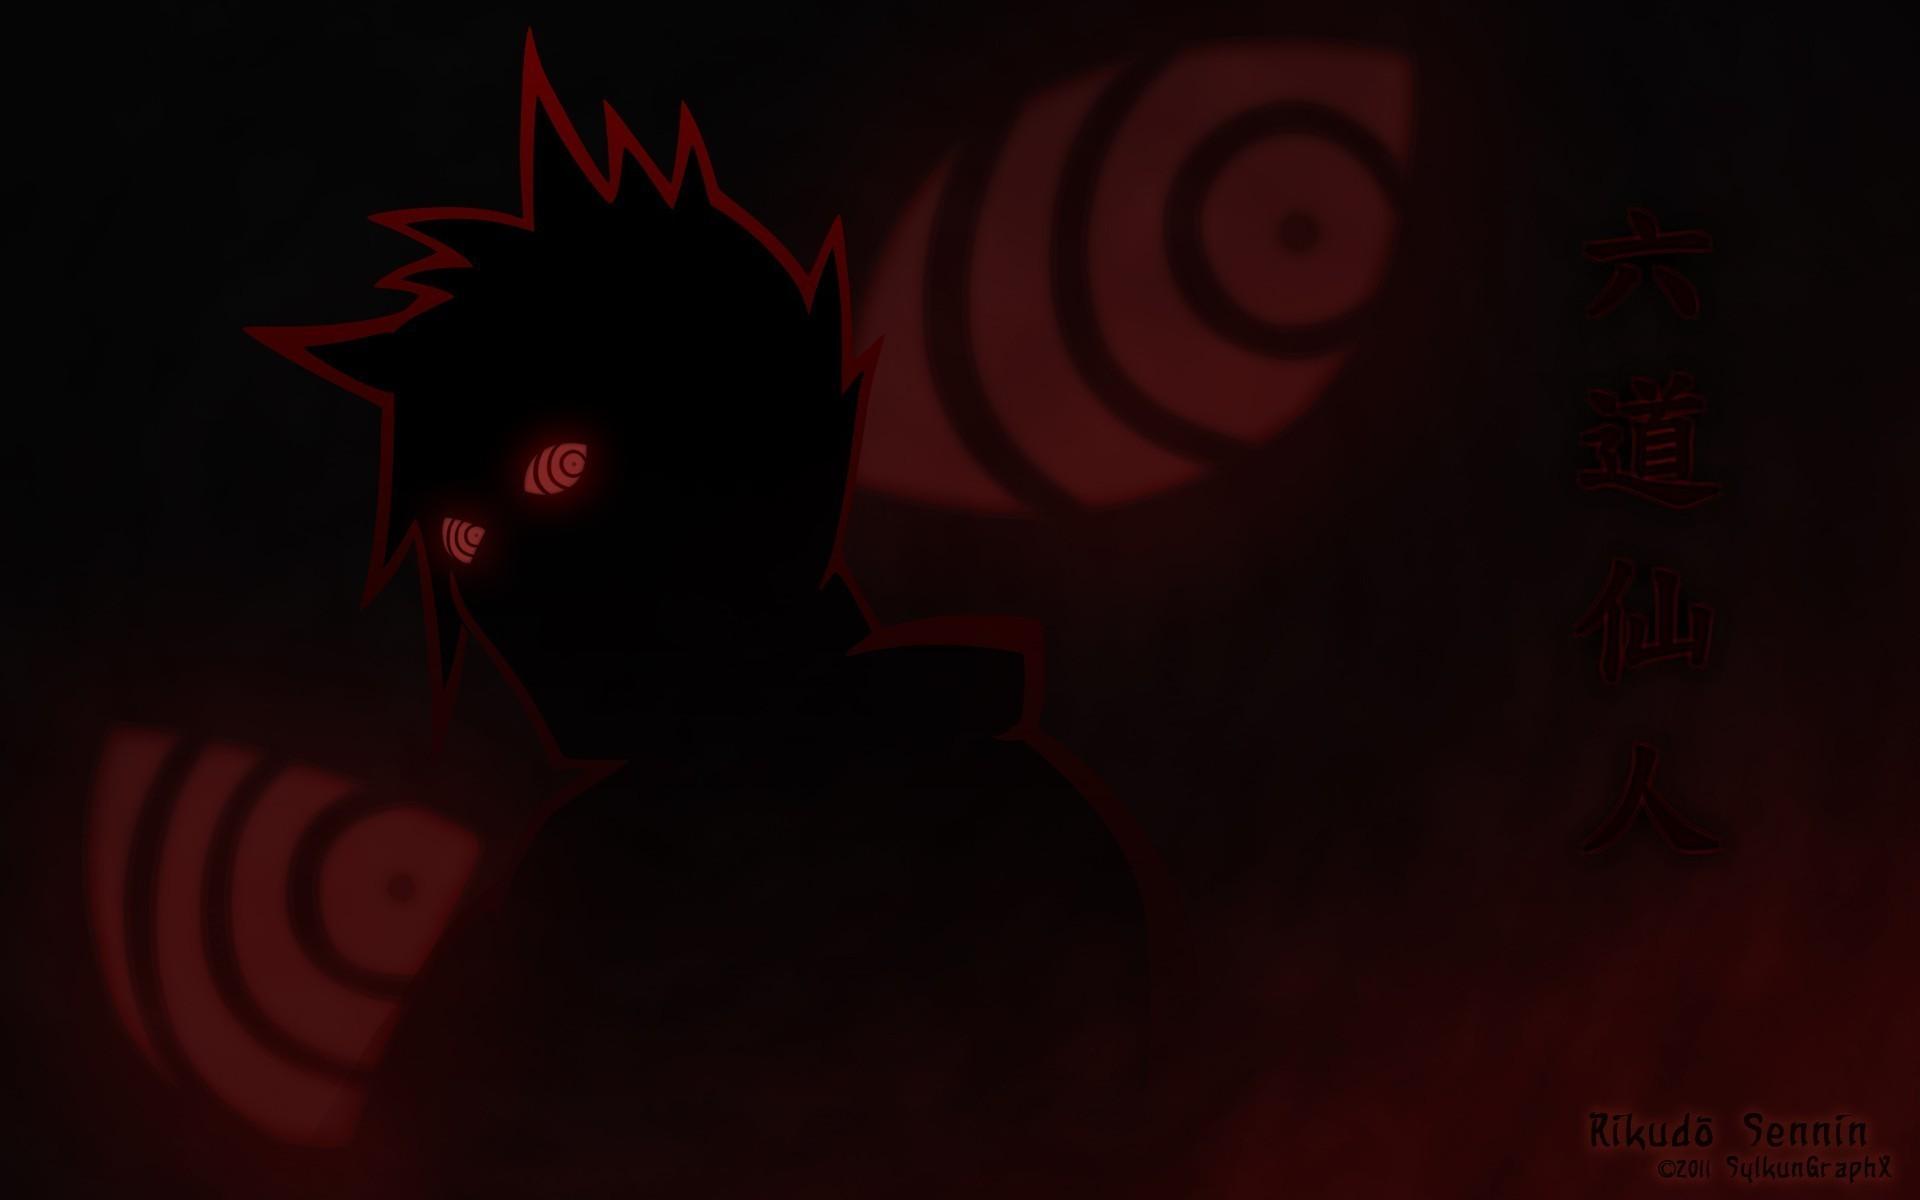 Res: 1920x1200, Naruto Shippuden Rikudo sennin Rinnegan Augen Silhouetten wallpaper